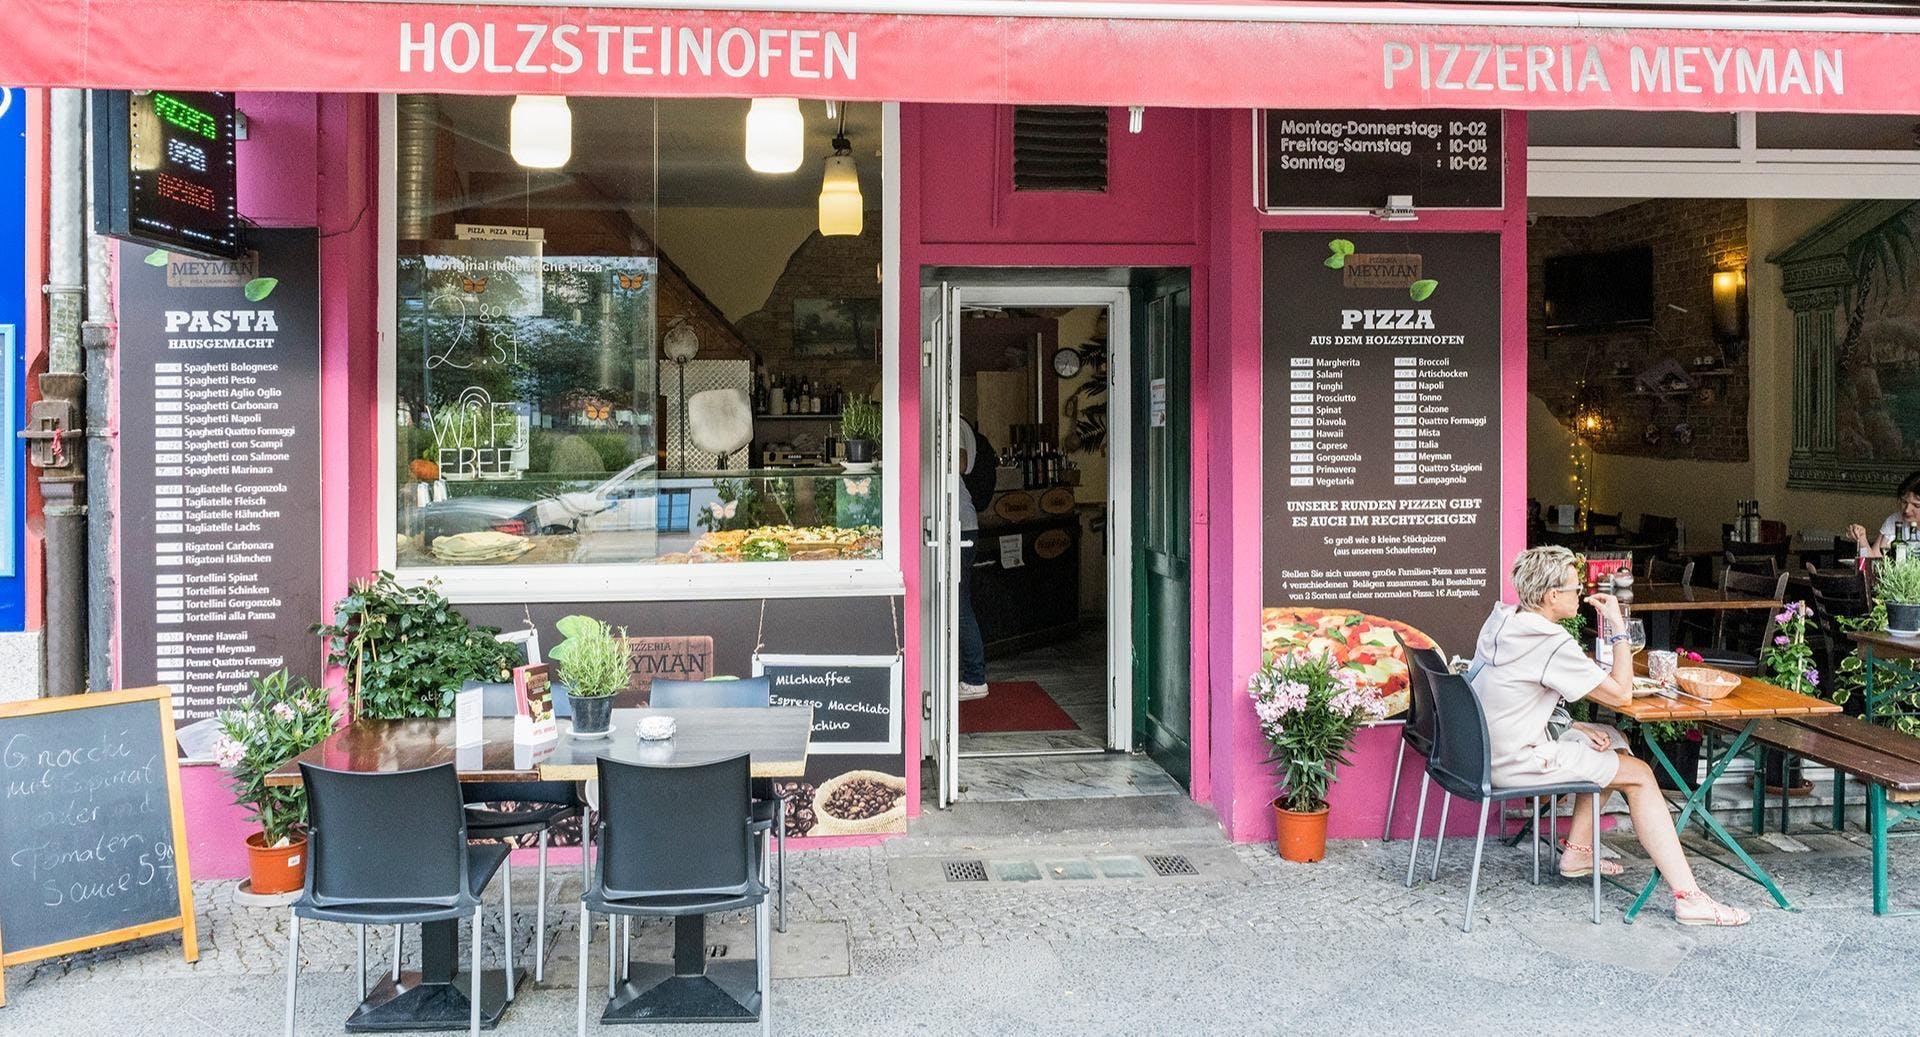 Meyman Pizzeria Berlin image 1